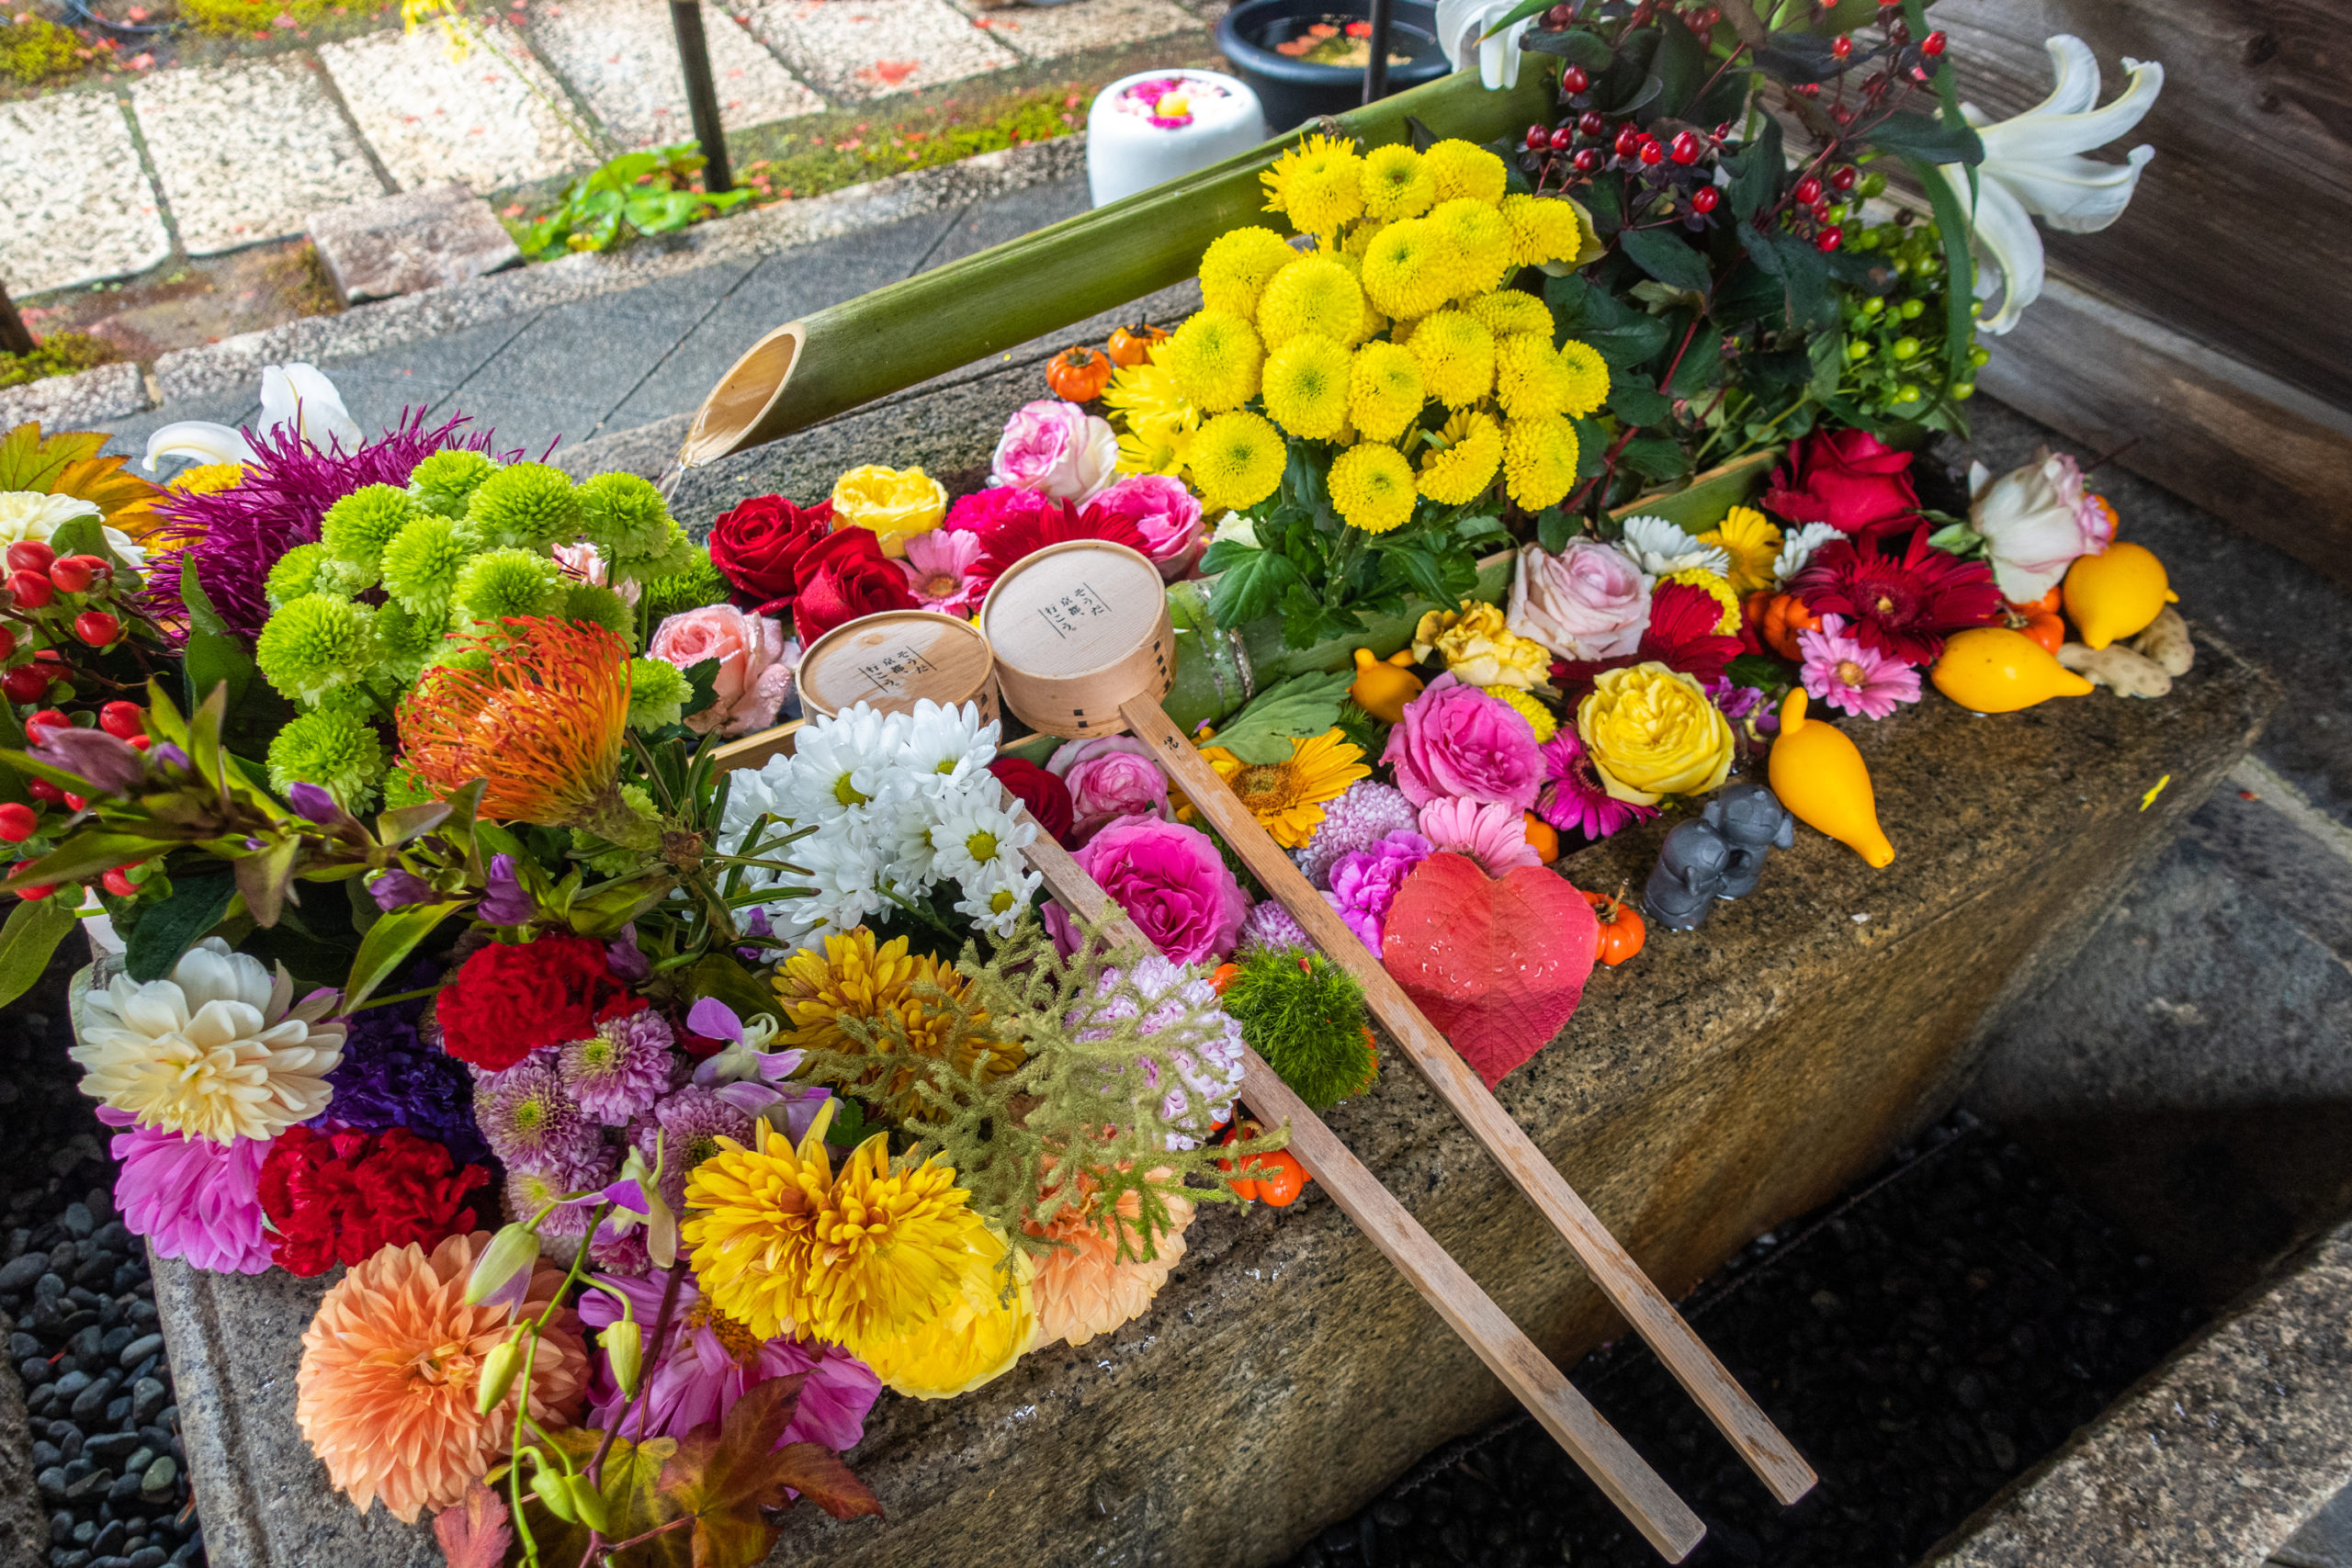 DSC00887-scaled 京都  勝林寺(紅葉と和傘の風情を感じる景色が美しい秋におすすめのスポット!撮影した写真の紹介、アクセス情報など)